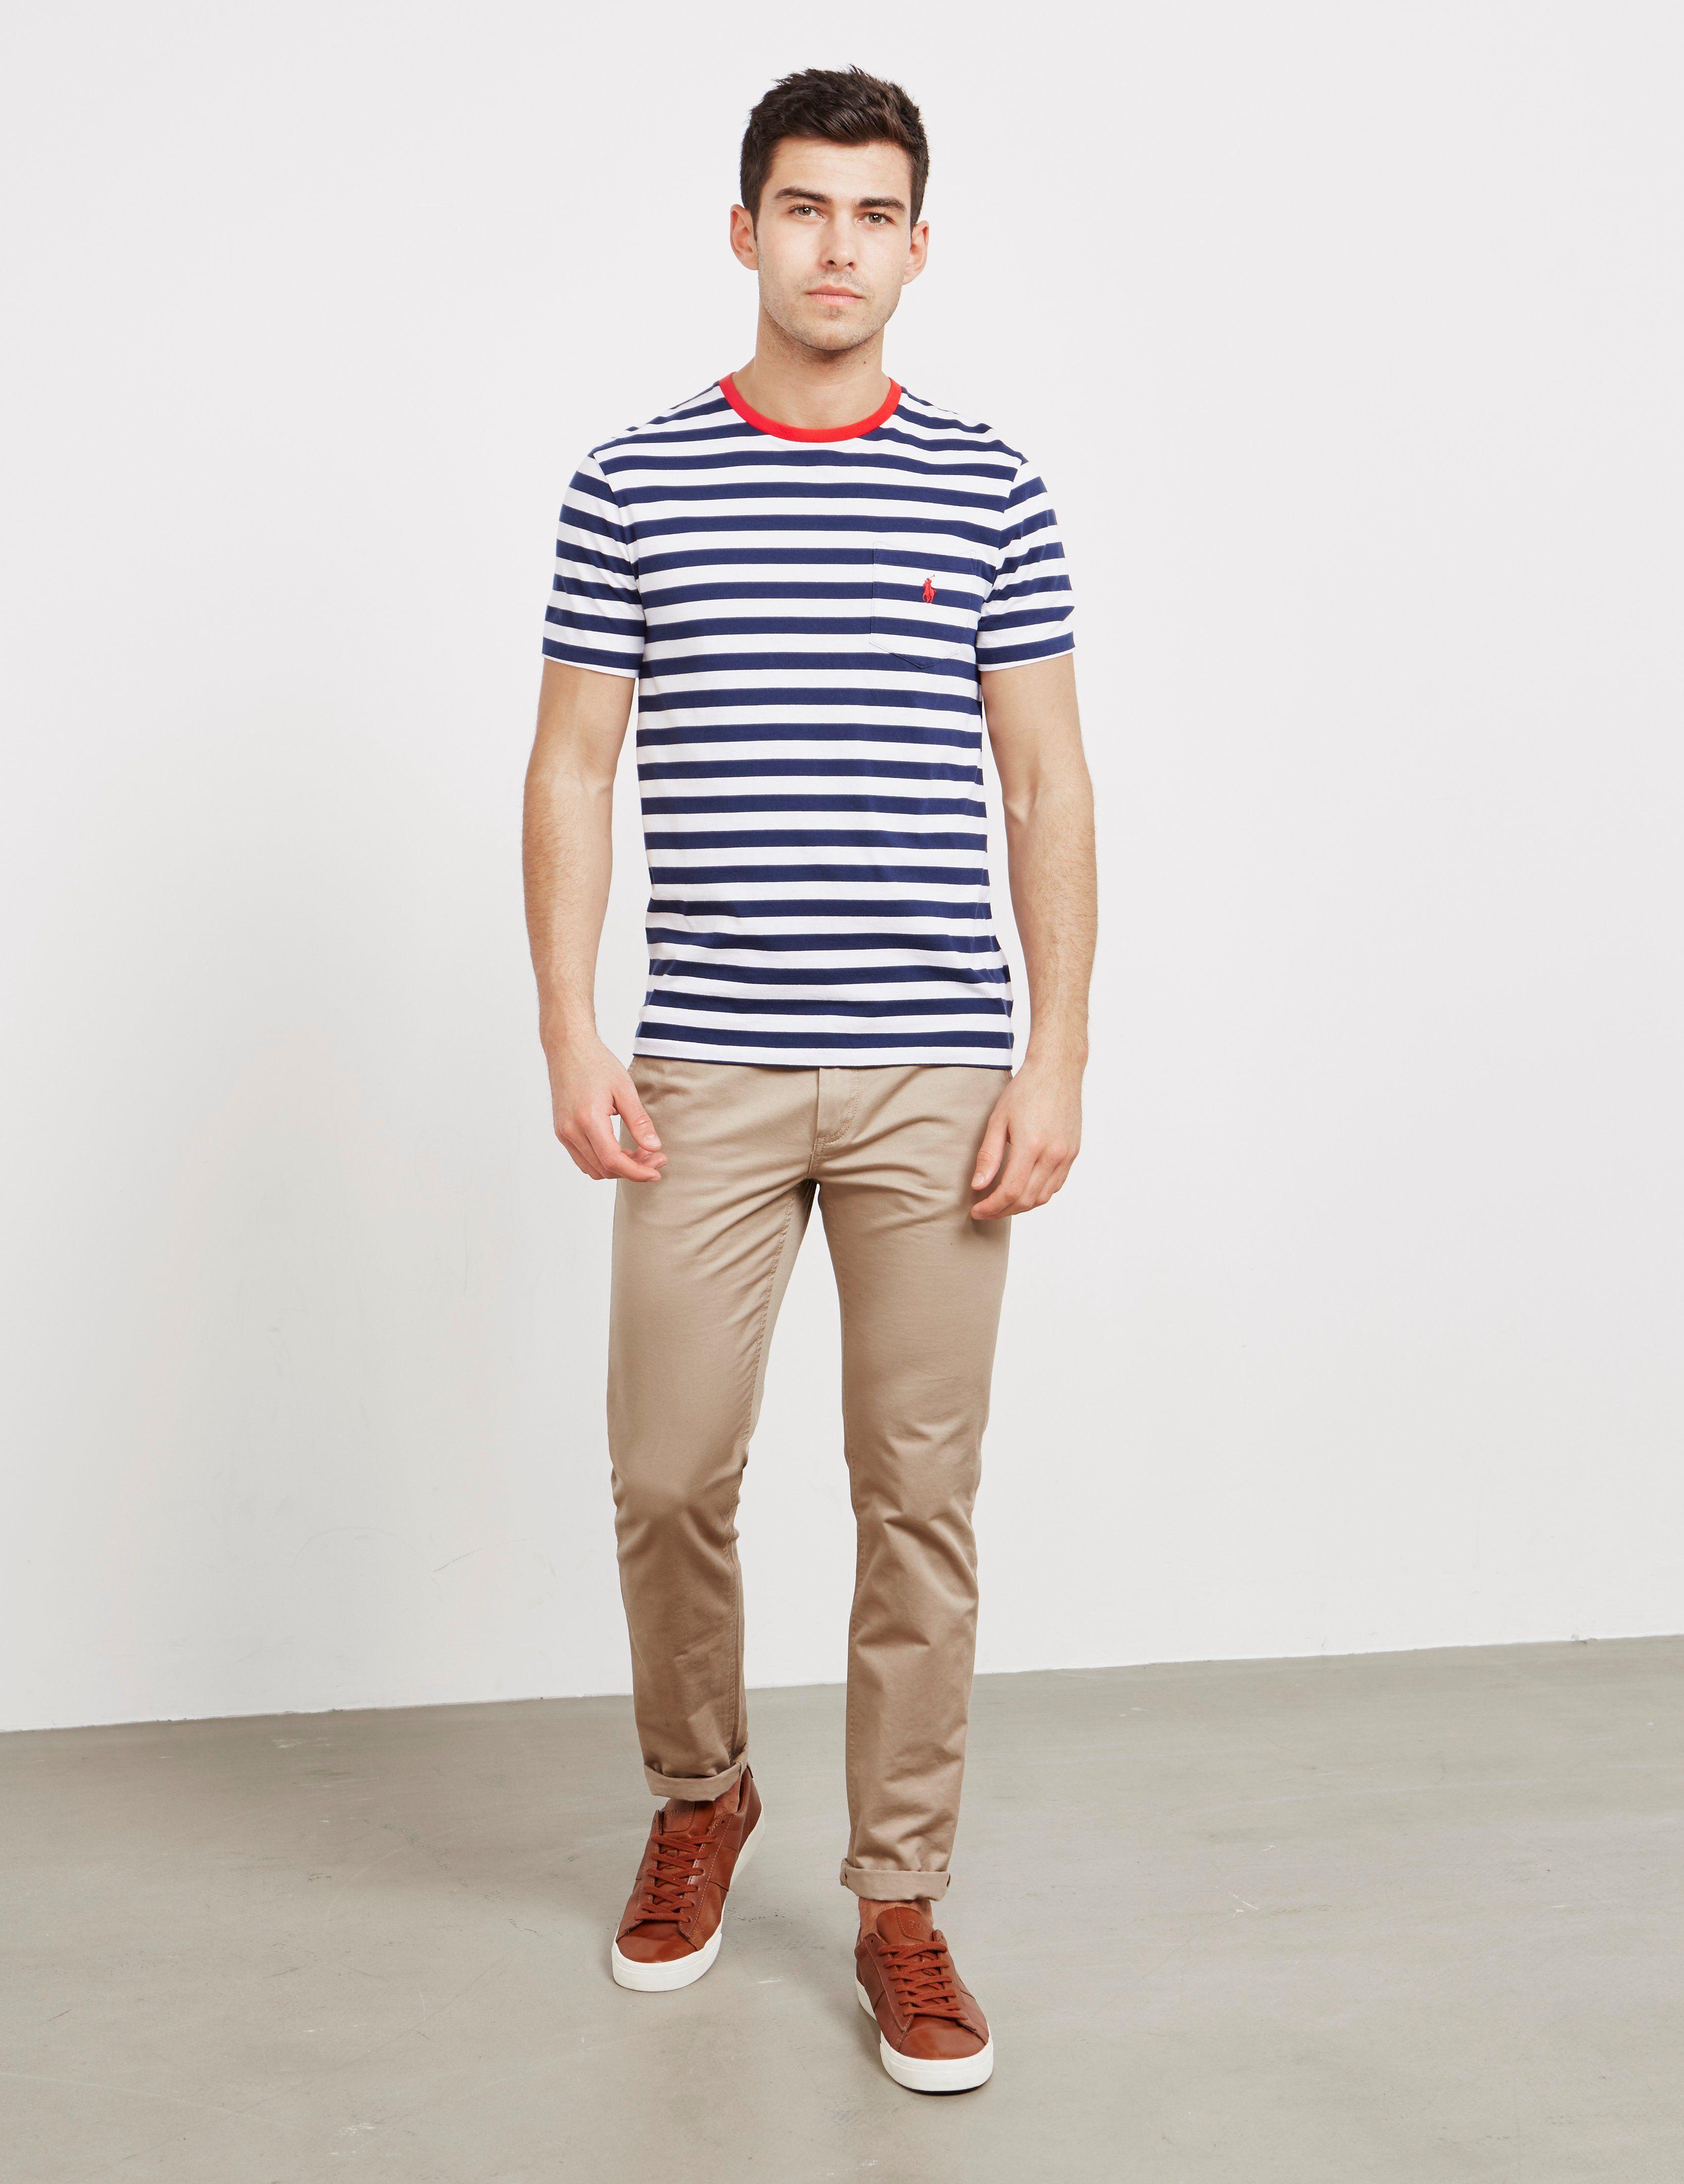 Polo Ralph Lauren Stripe Short Sleeve T-Shirt - Online Exclusive